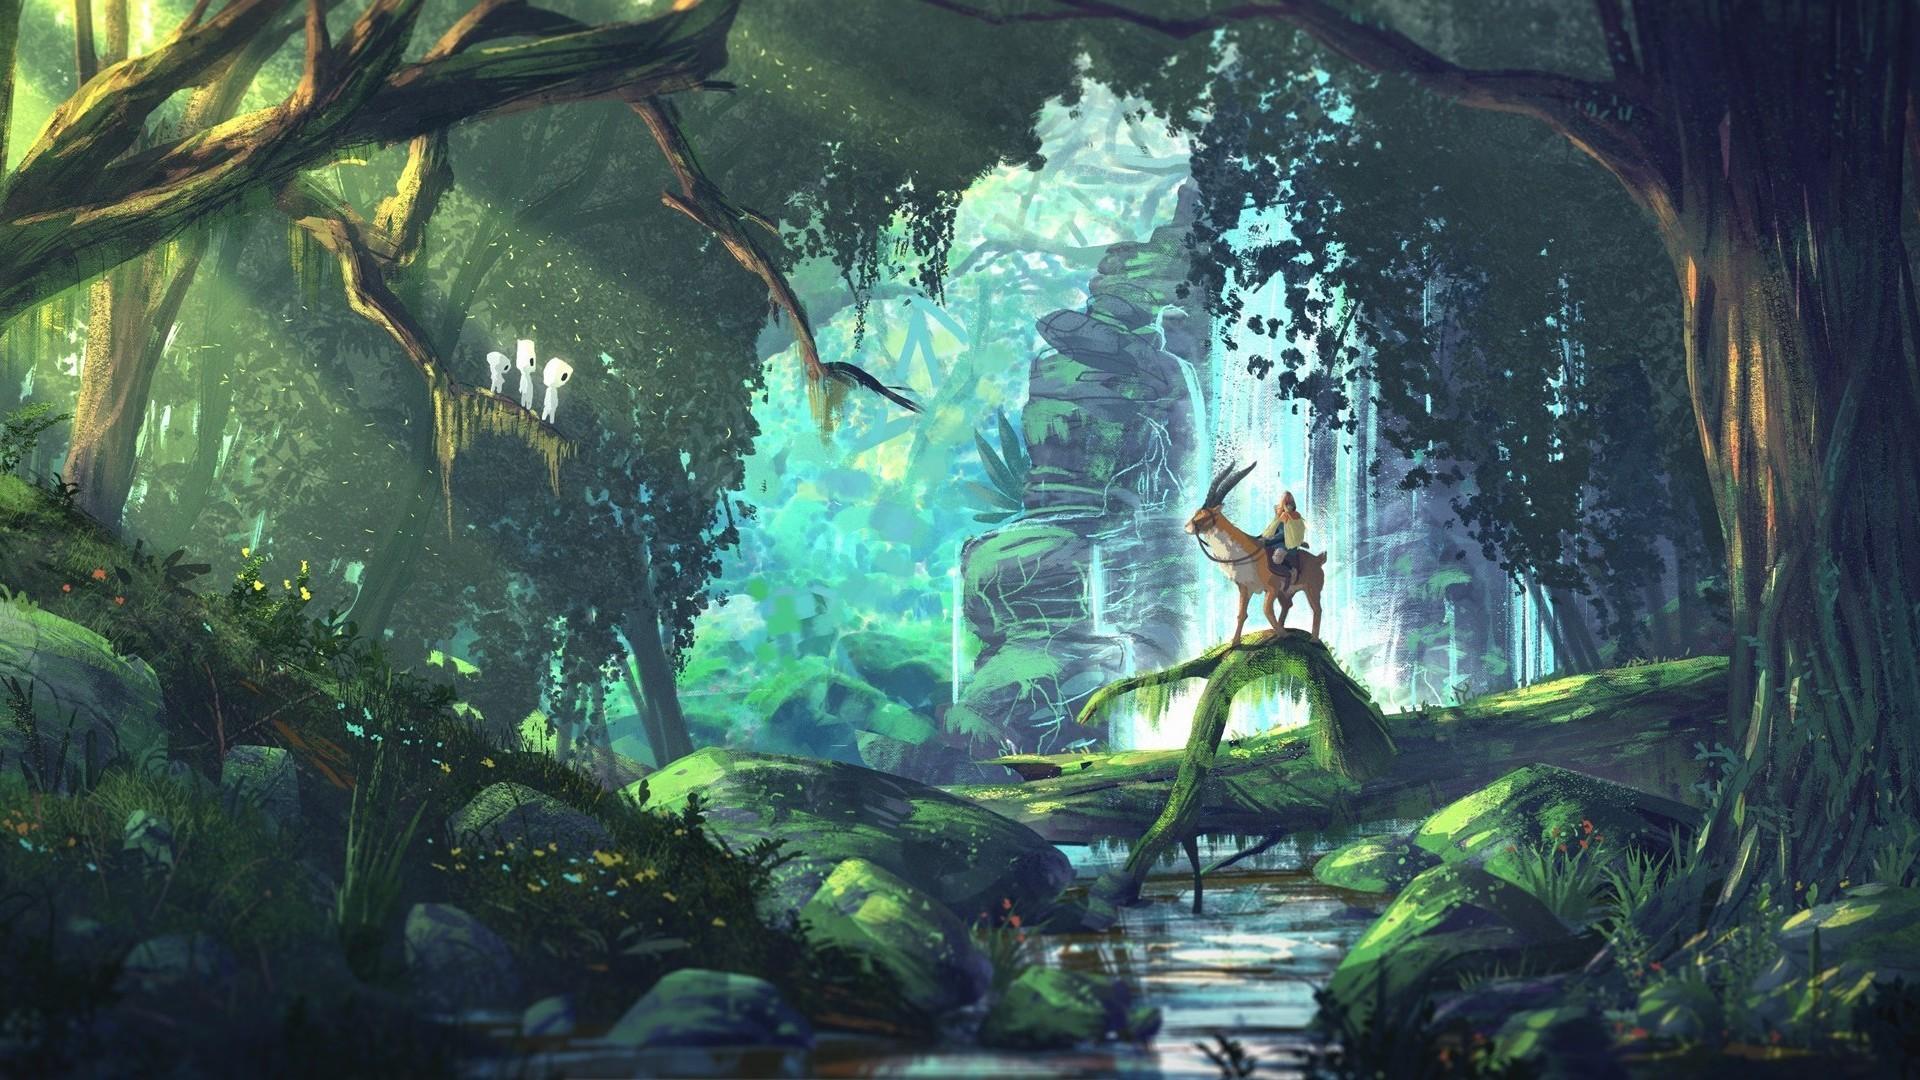 Forest Iphone Wallpaper Studio Ghibli Wallpaper 183 ① Download Free Stunning Hd